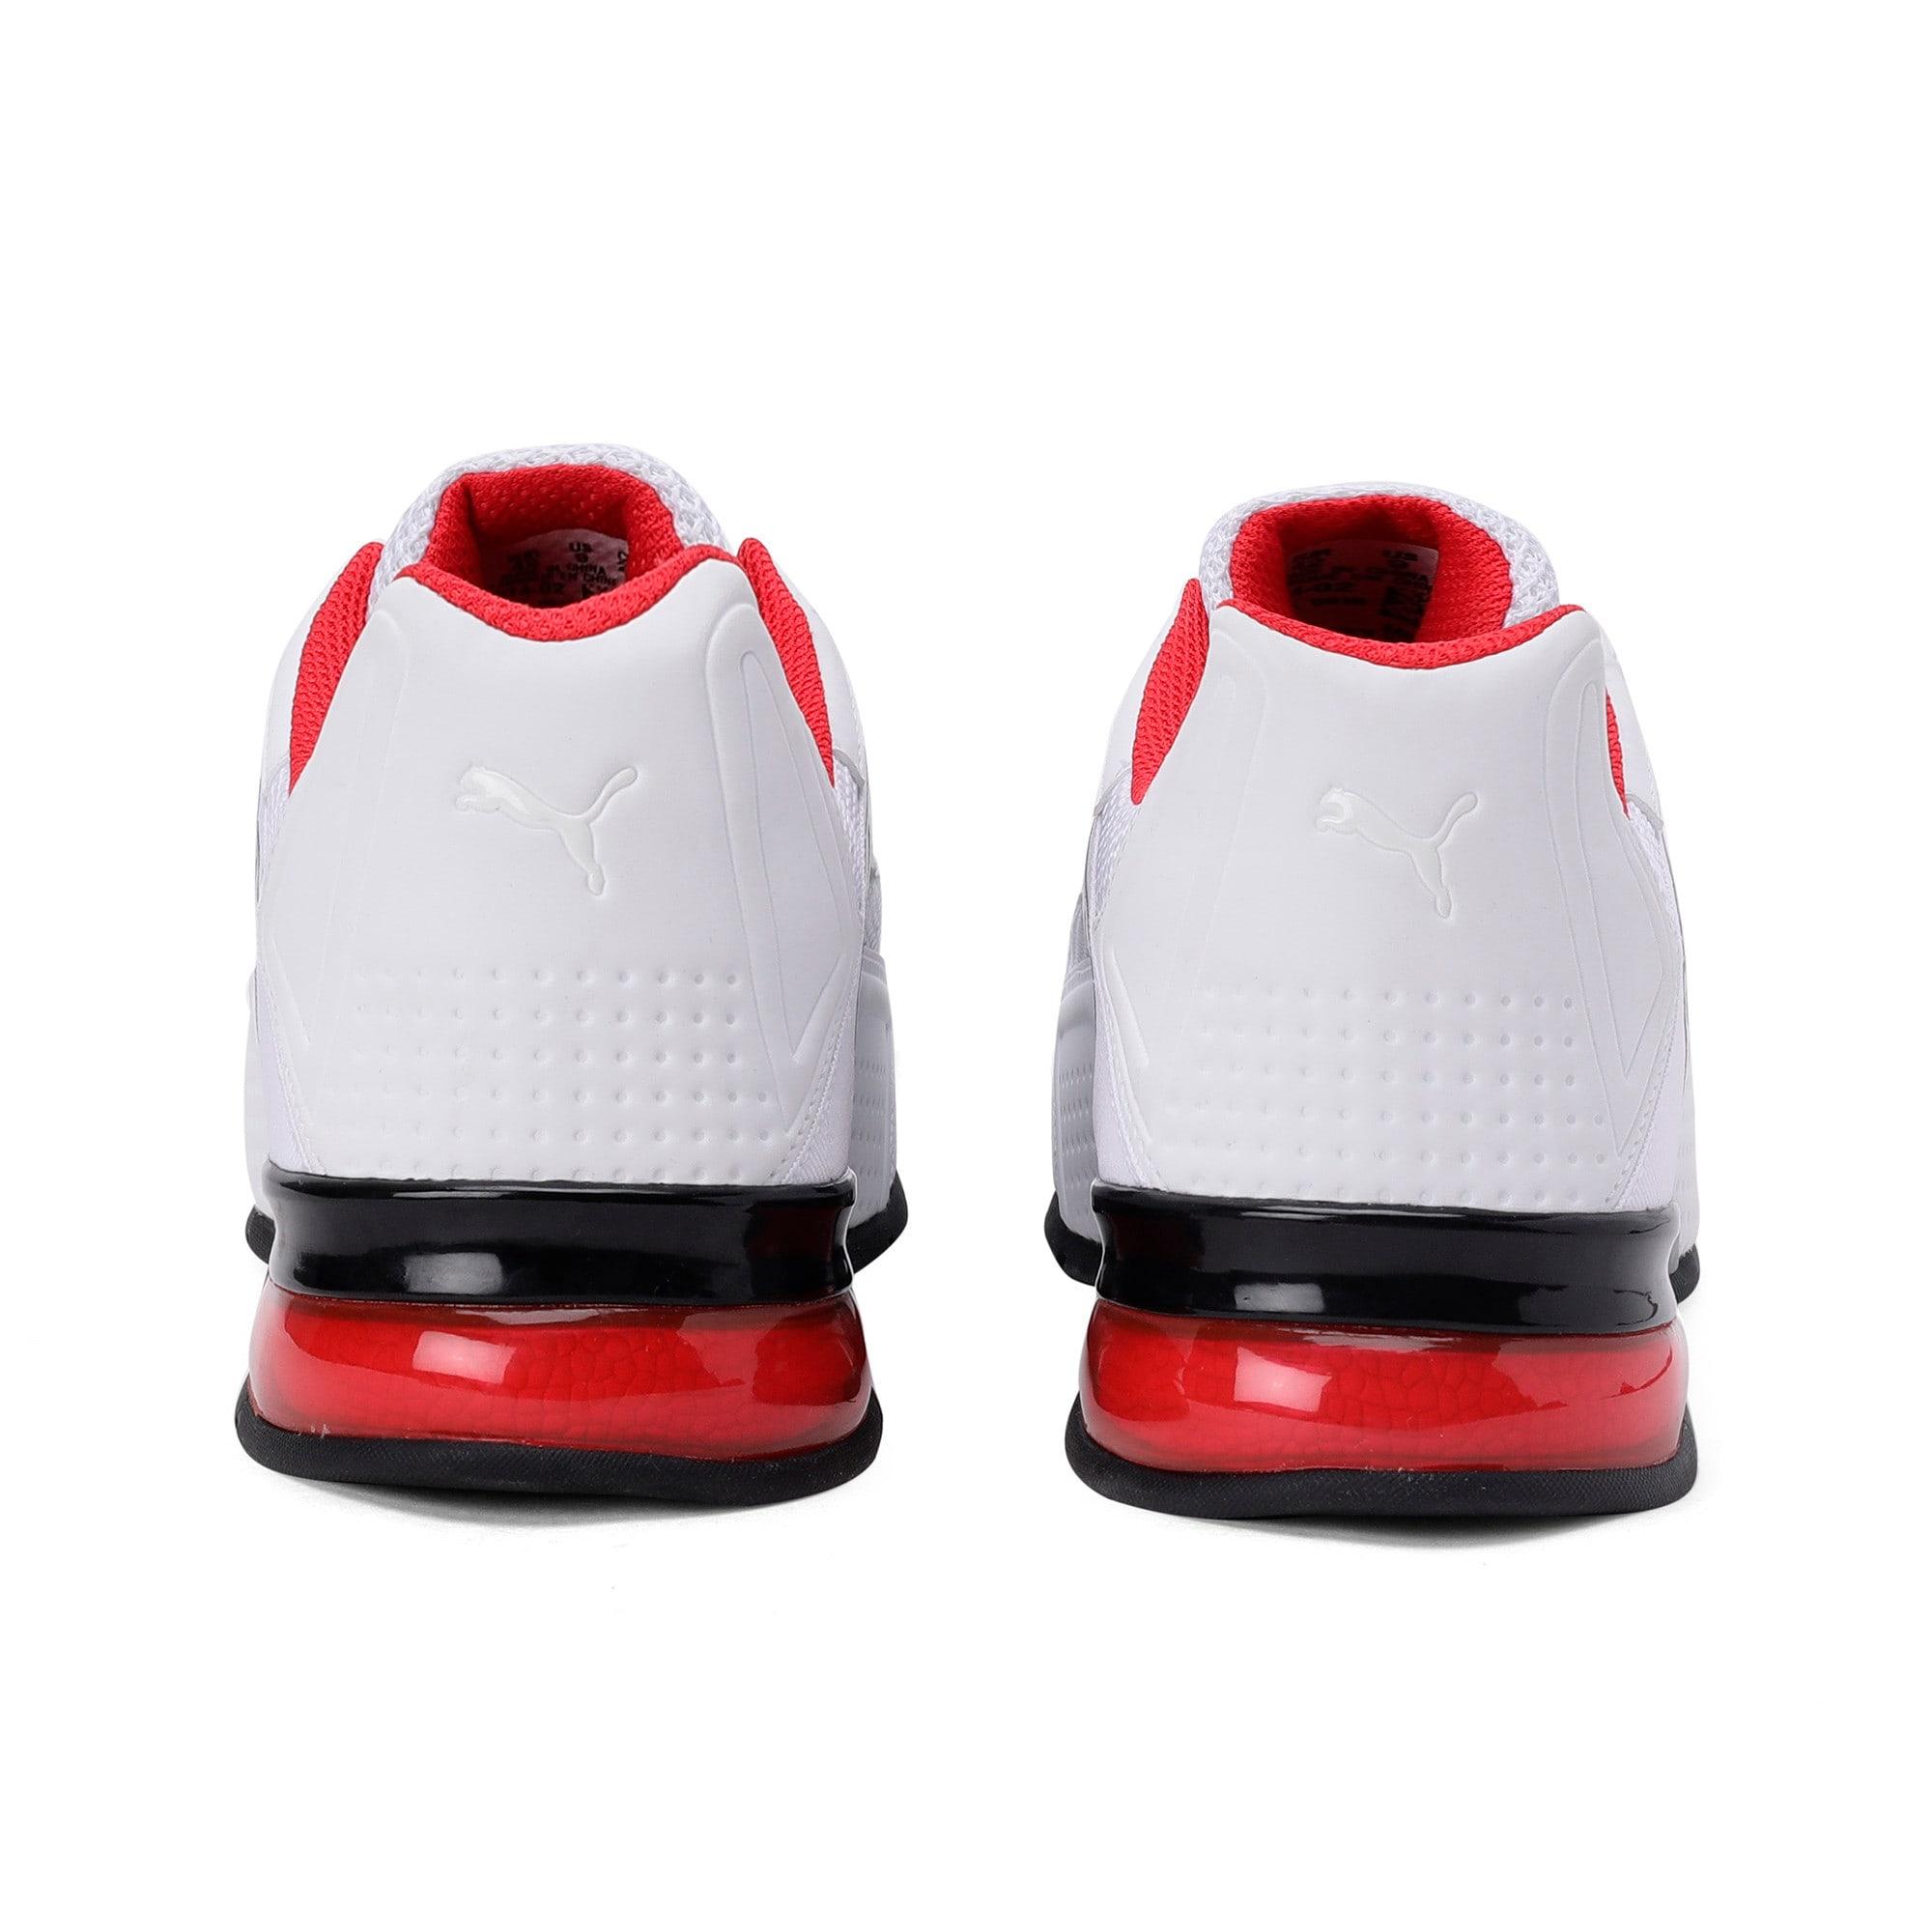 Thumbnail 3 of Leader VT NU Training Shoes, Puma Wht-Hgh Rsk Rd-Pma Blk, medium-IND